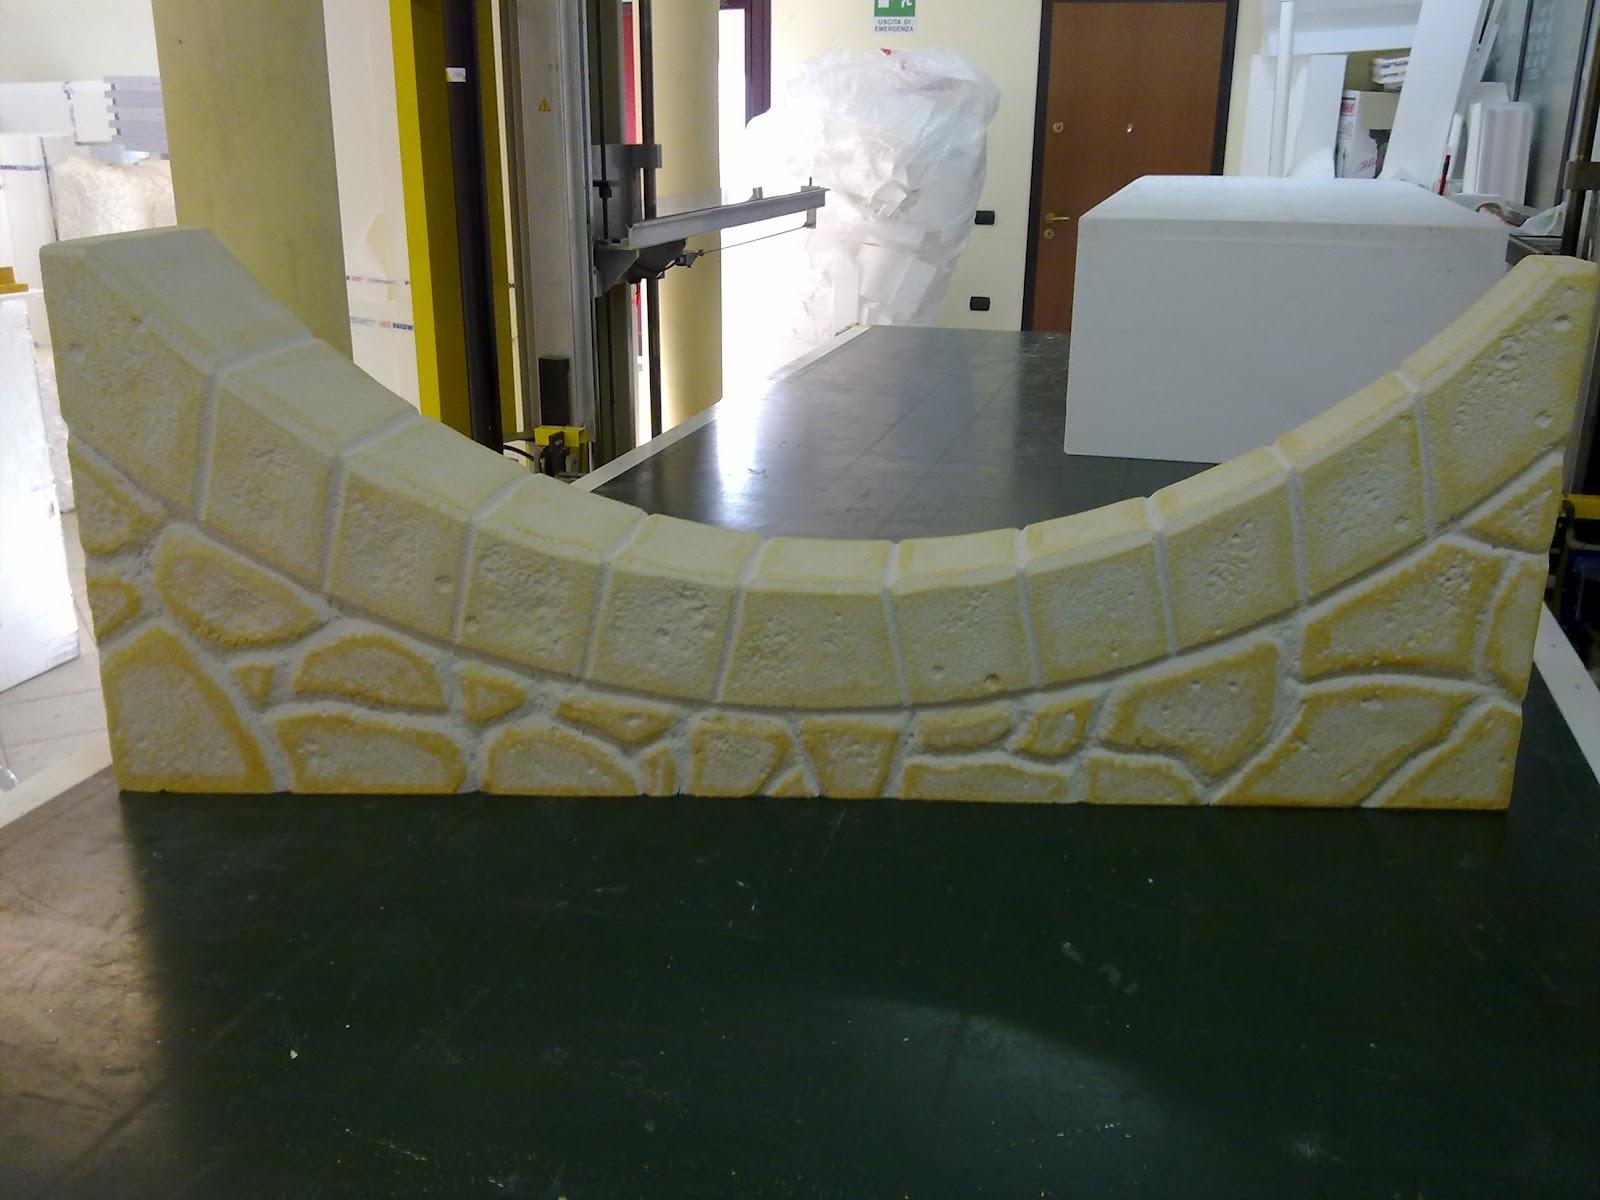 Poliemme sagome in polistirolo espanso finta pietra for Pannelli decorativi polistirolo finta pietra